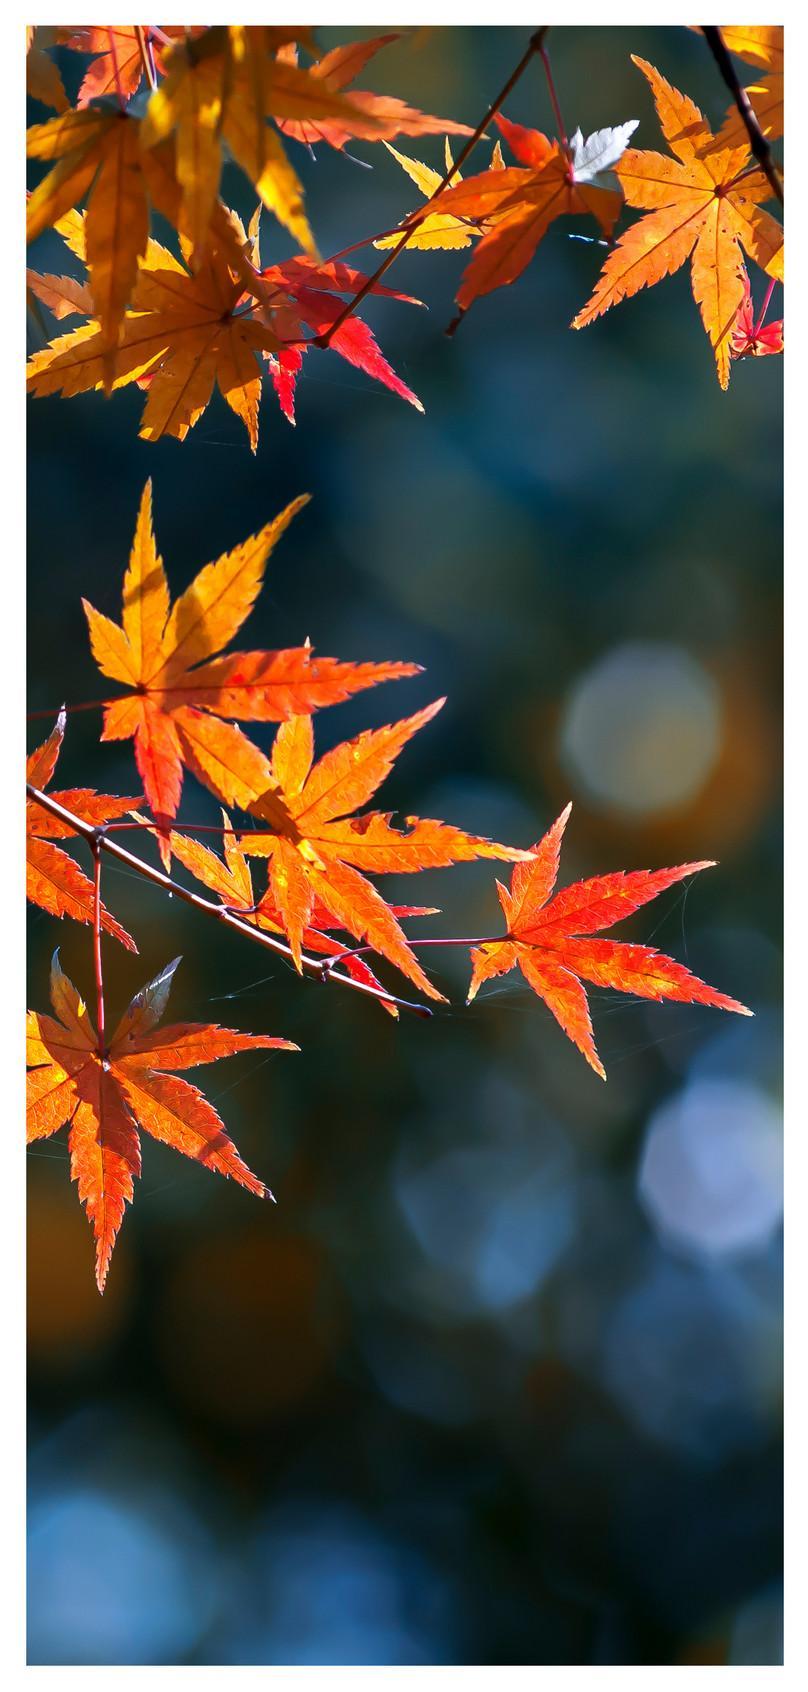 Hình nền điện thoại di động 808x1692 Maple Leaf In Late Autumn - Wallpaper